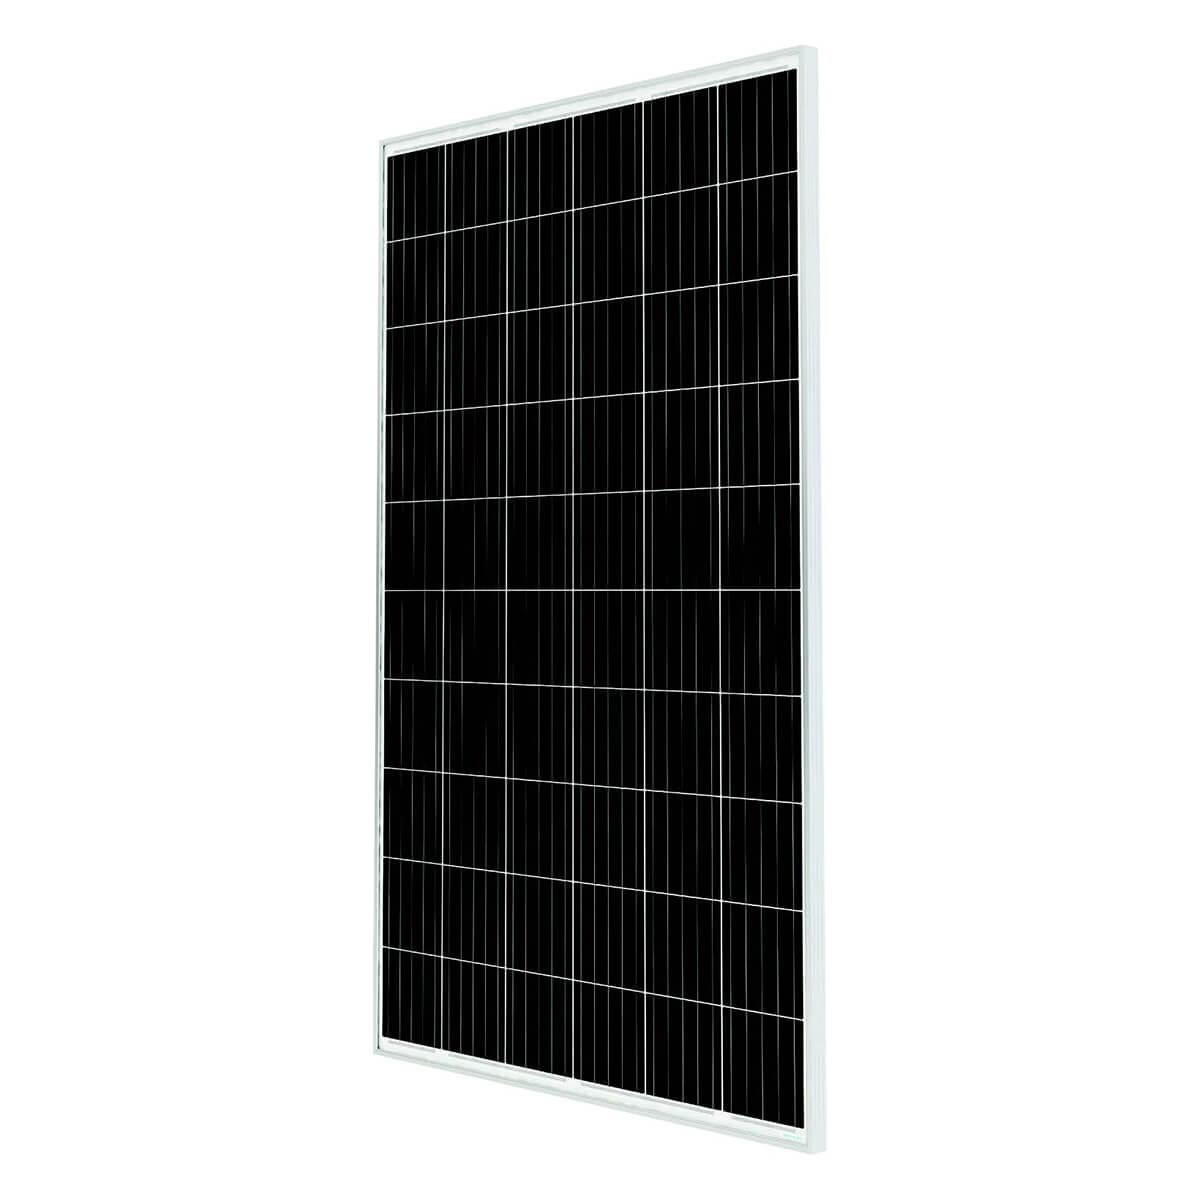 cw enerji 325W panel, cw enerji 325Watt panel, cw enerji 325 W panel, cw enerji 325 Watt panel, cw enerji 325 Watt monokristal panel, cw enerji 325 W watt gunes paneli, cw enerji 325 W watt monokristal gunes paneli, cw enerji 325 W Watt fotovoltaik monokristal solar panel, cw enerji 325W monokristal gunes enerjisi, cw enerji CWT325-60PM-325W panel, CW Enerji 325 WATT